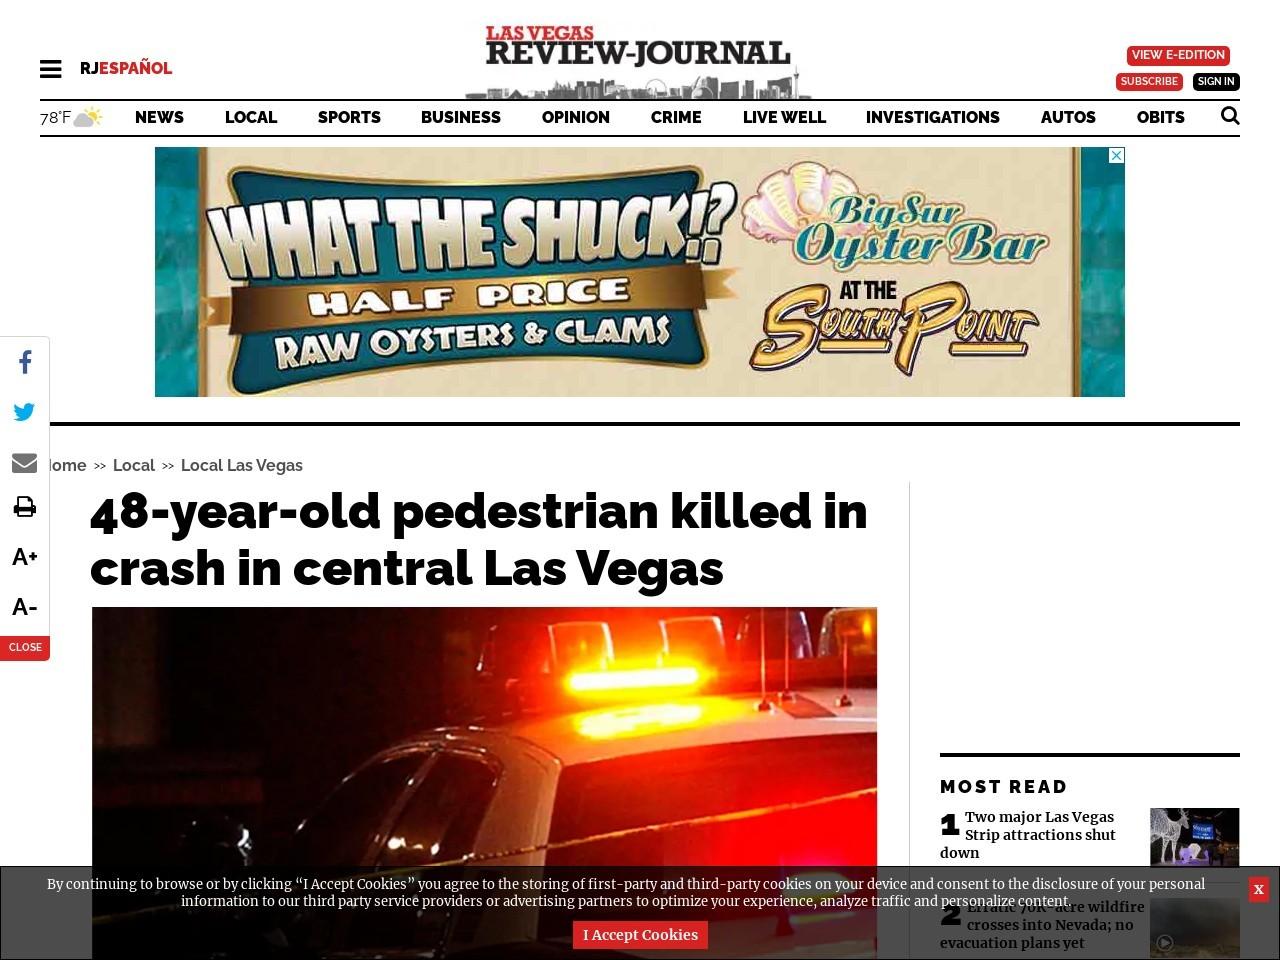 Pedestrian killed in crash in central Las Vegas